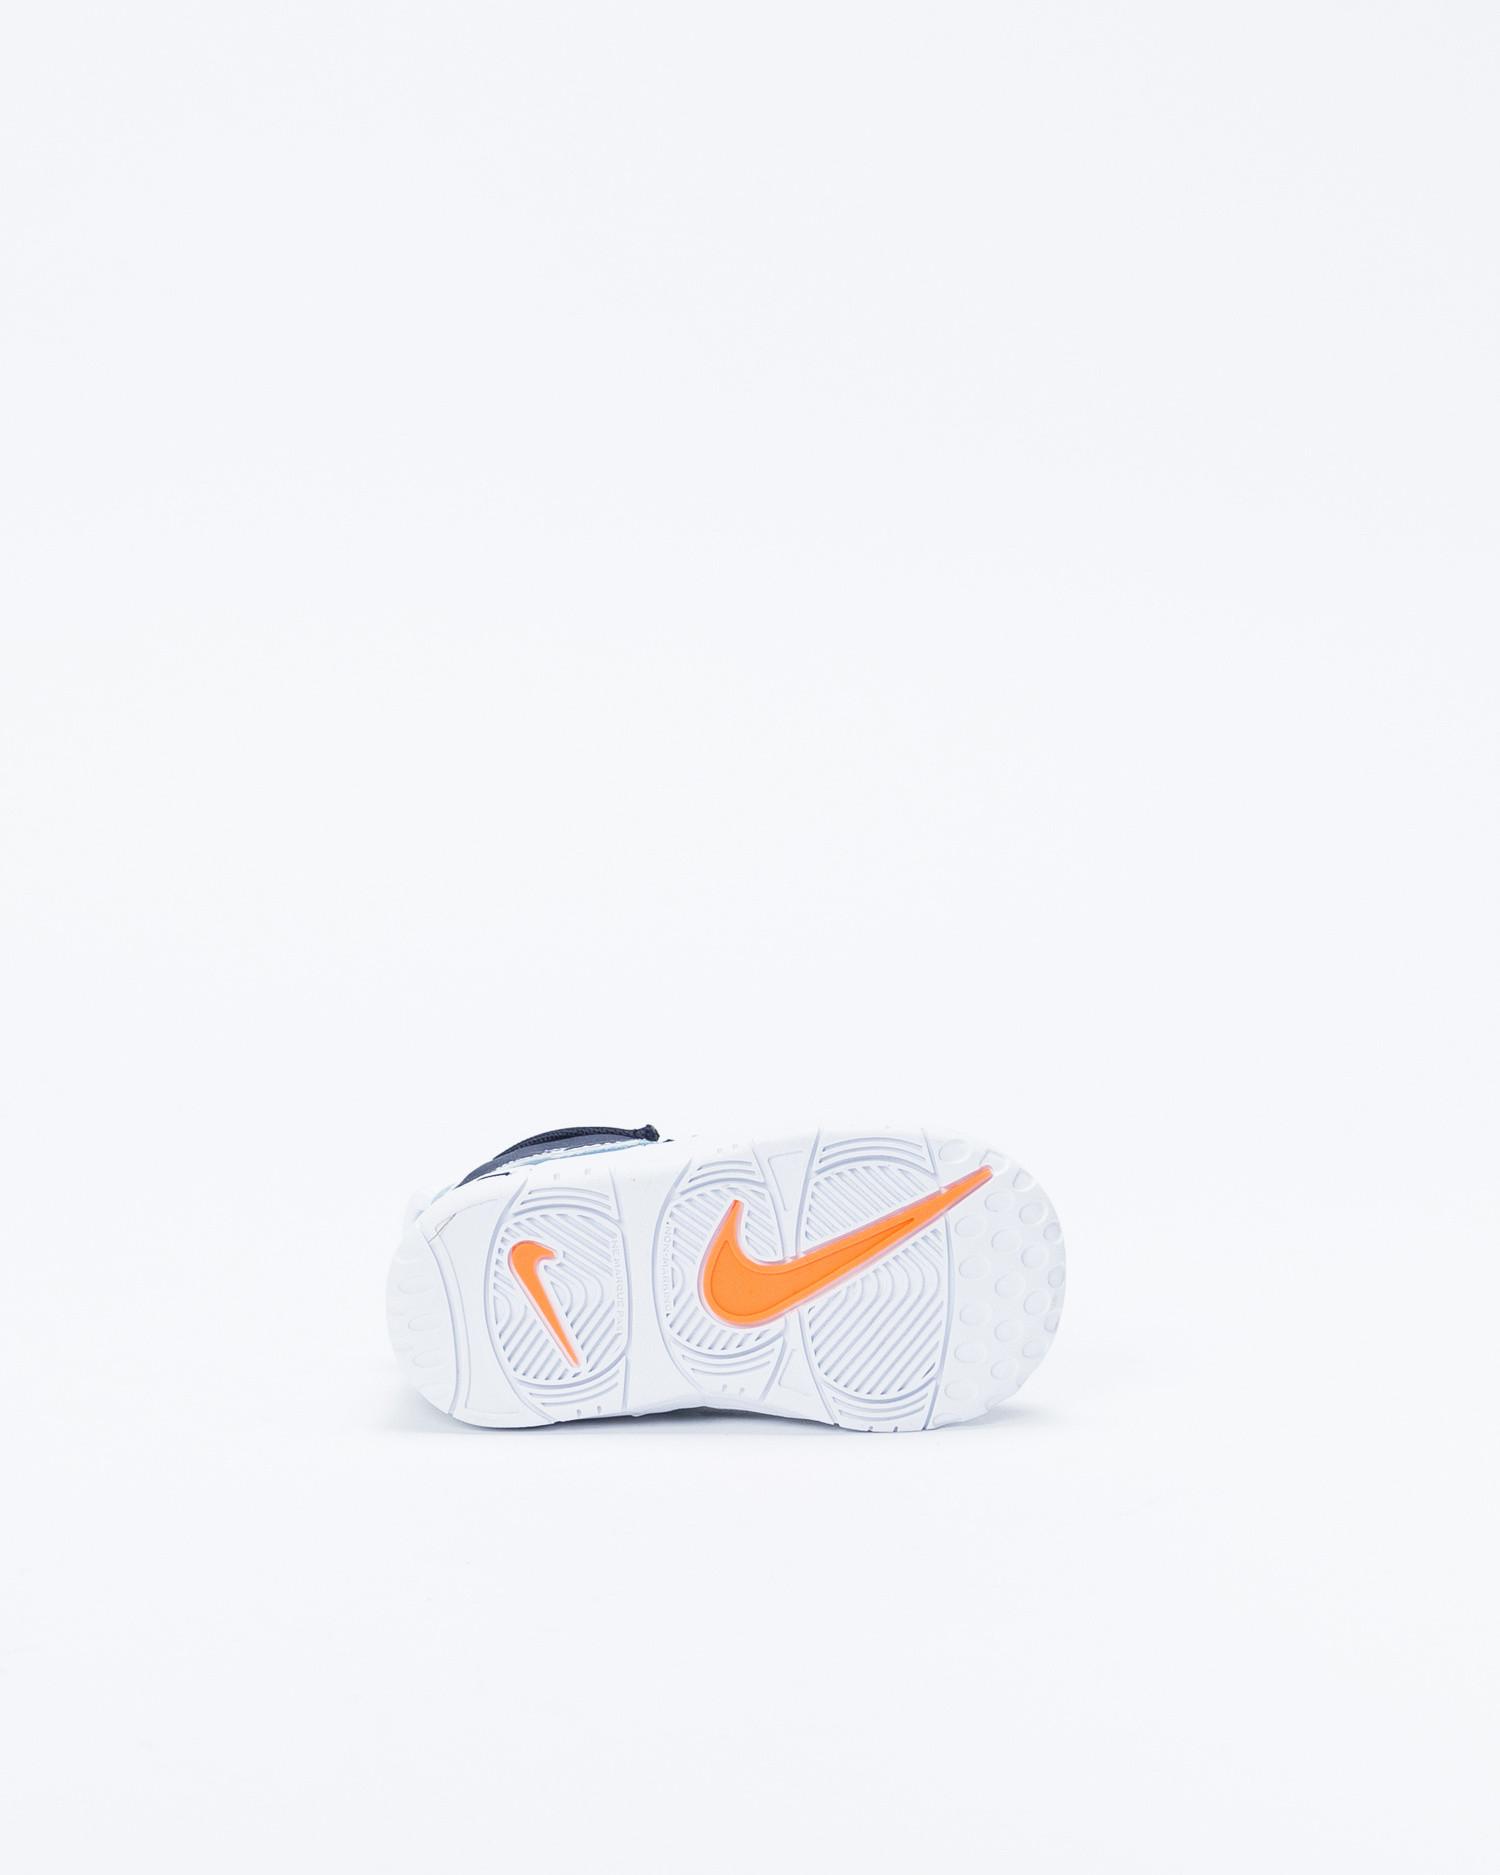 Nike Air More Uptempo Aegean Storm/Blackened Blue-Total Orange